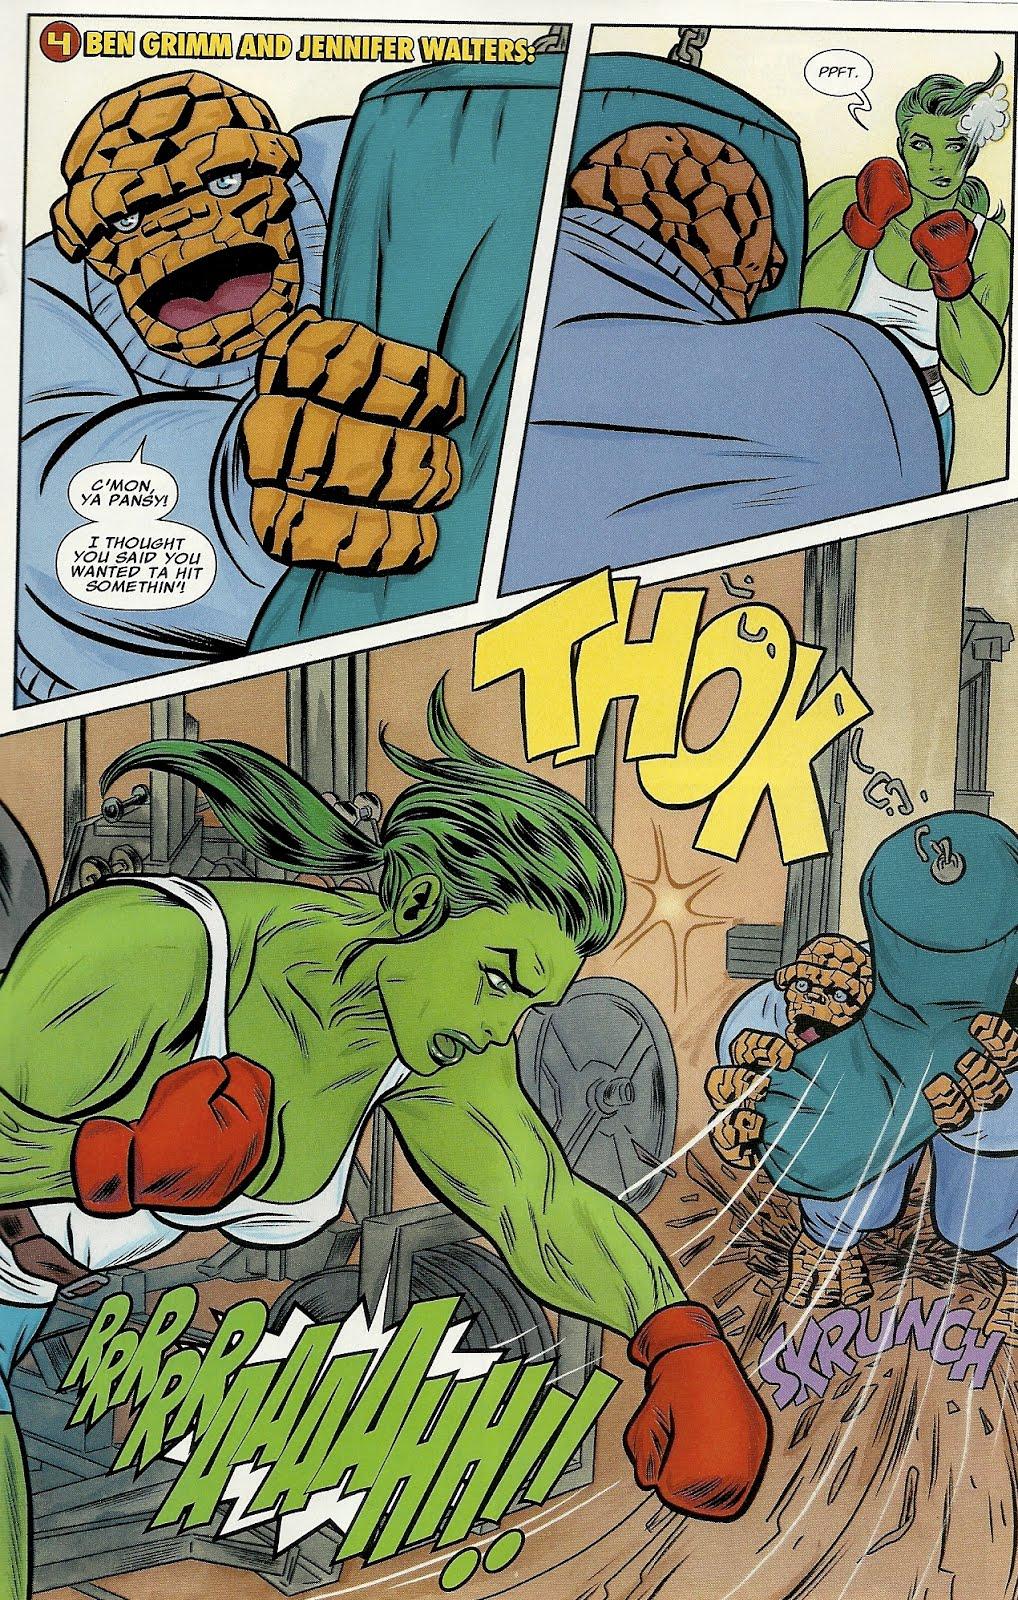 Hulk Fucks She Hulk Cheap not the shirtless she-hulk you were expecting   metafilter